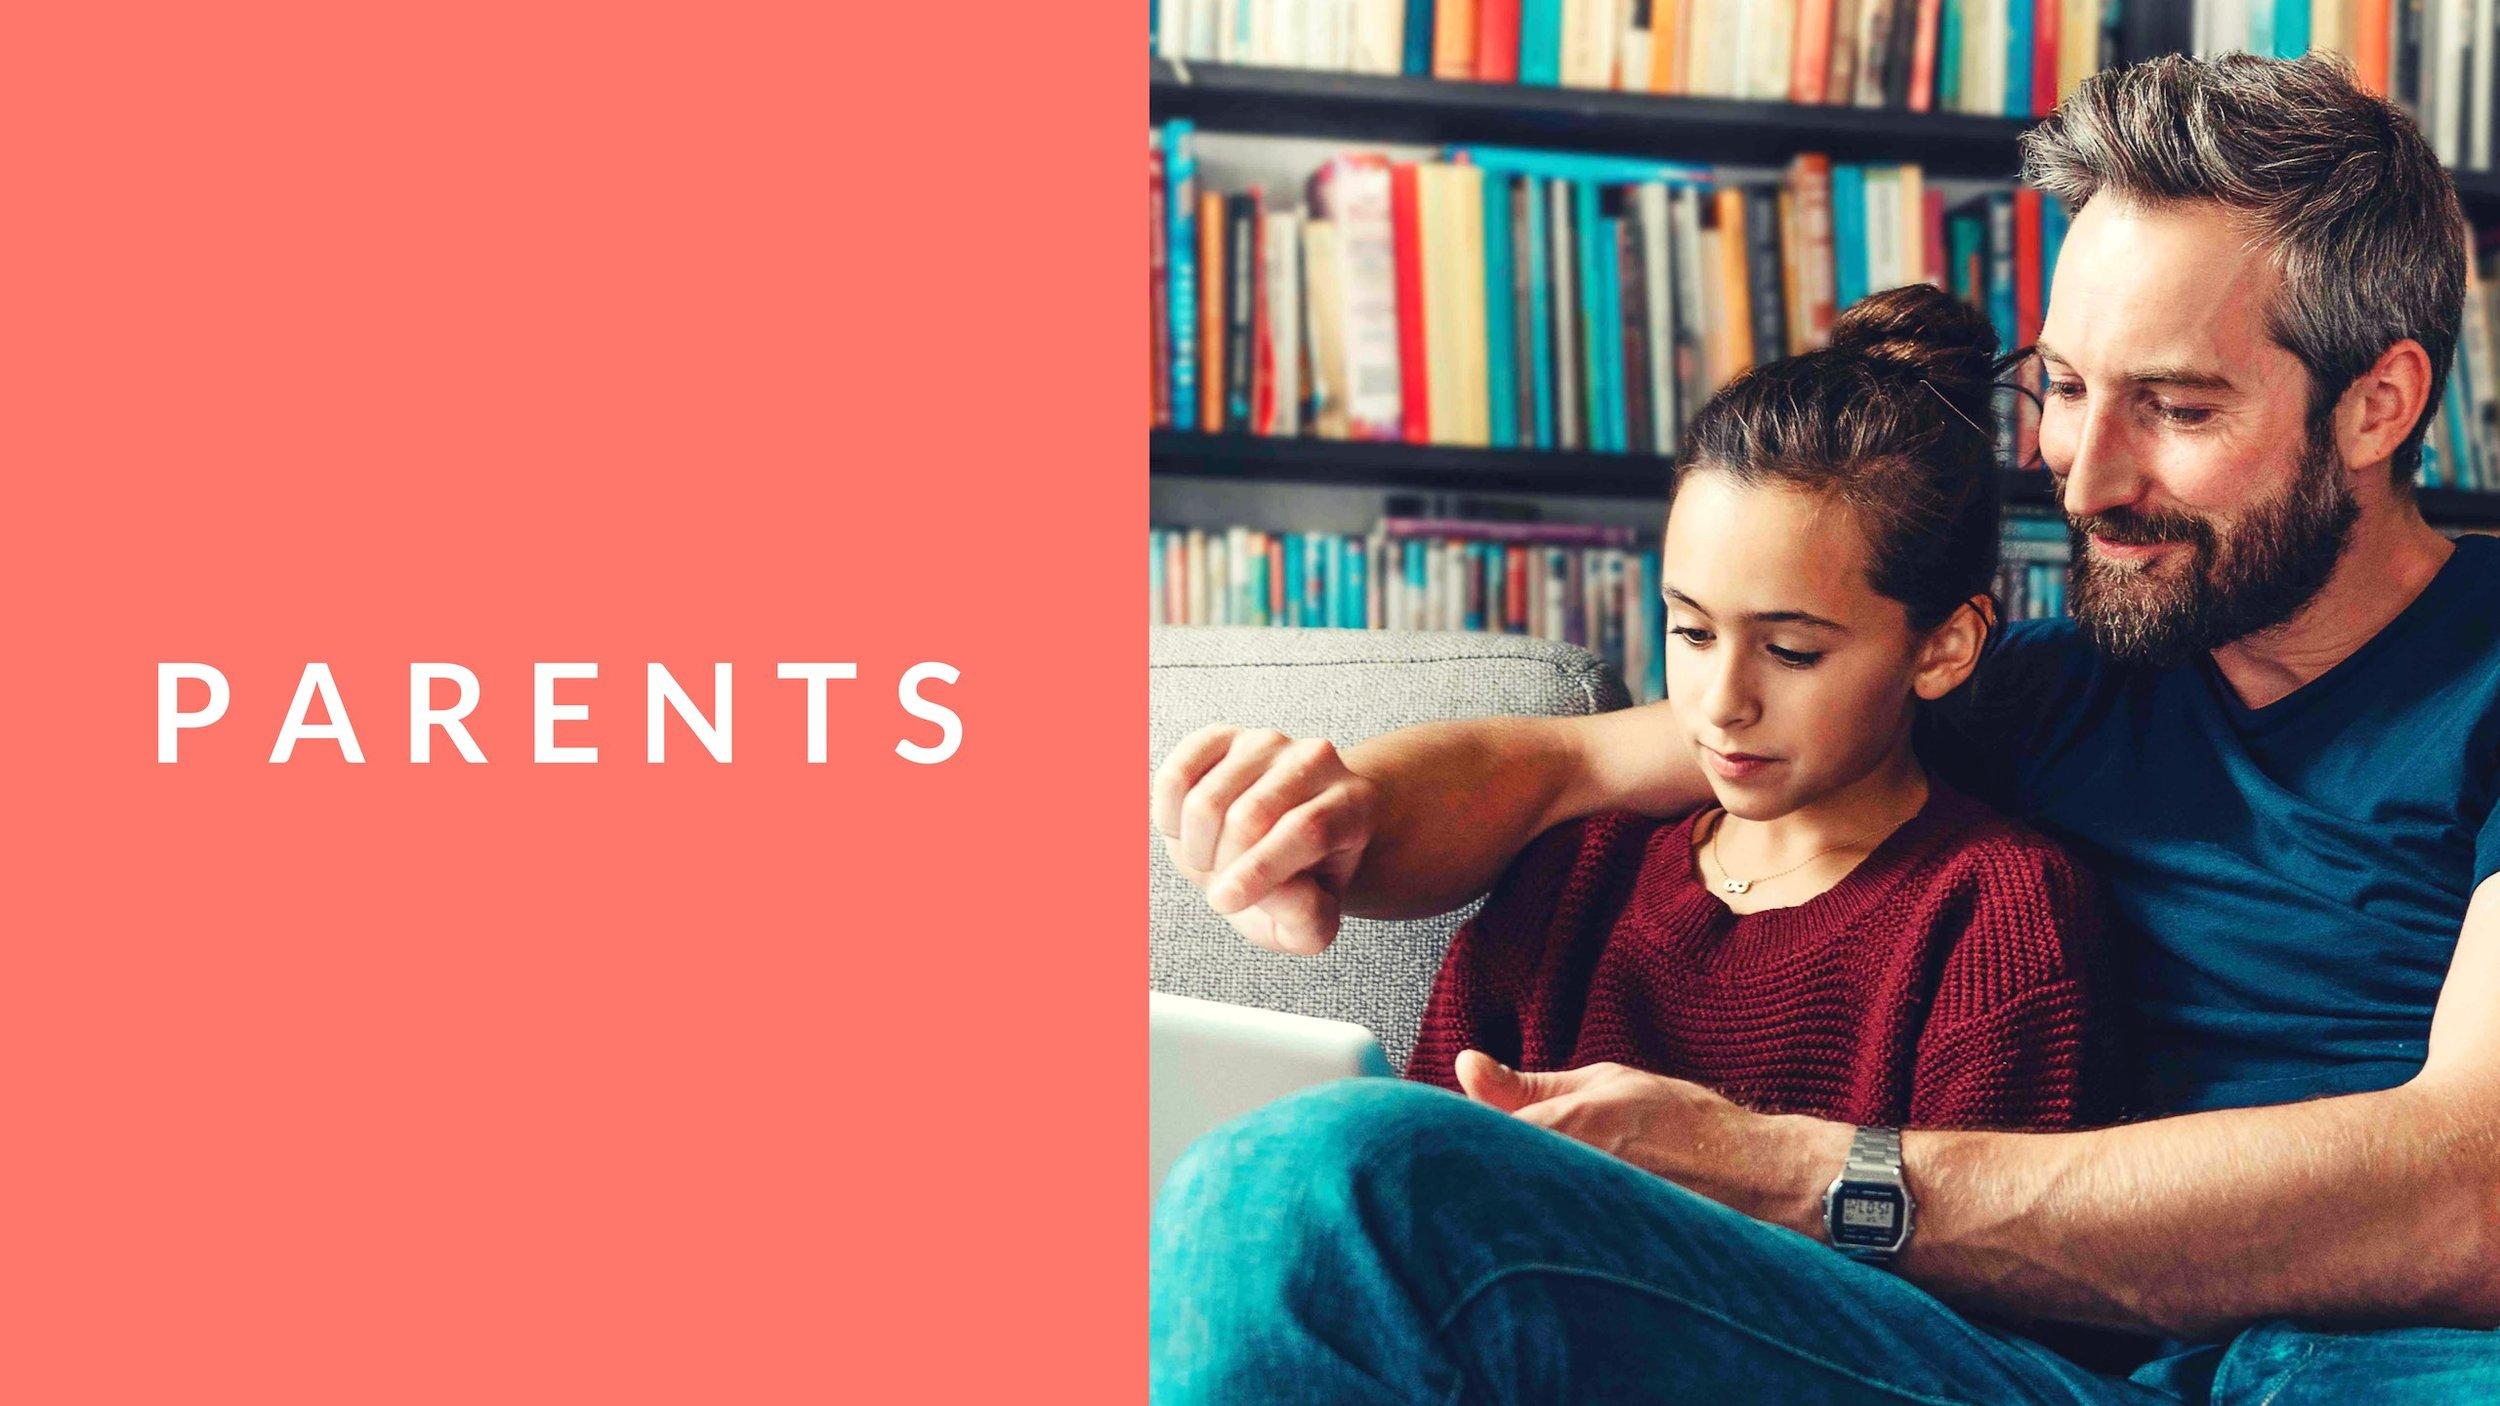 Design - Parents-txt-jpeg.jpg